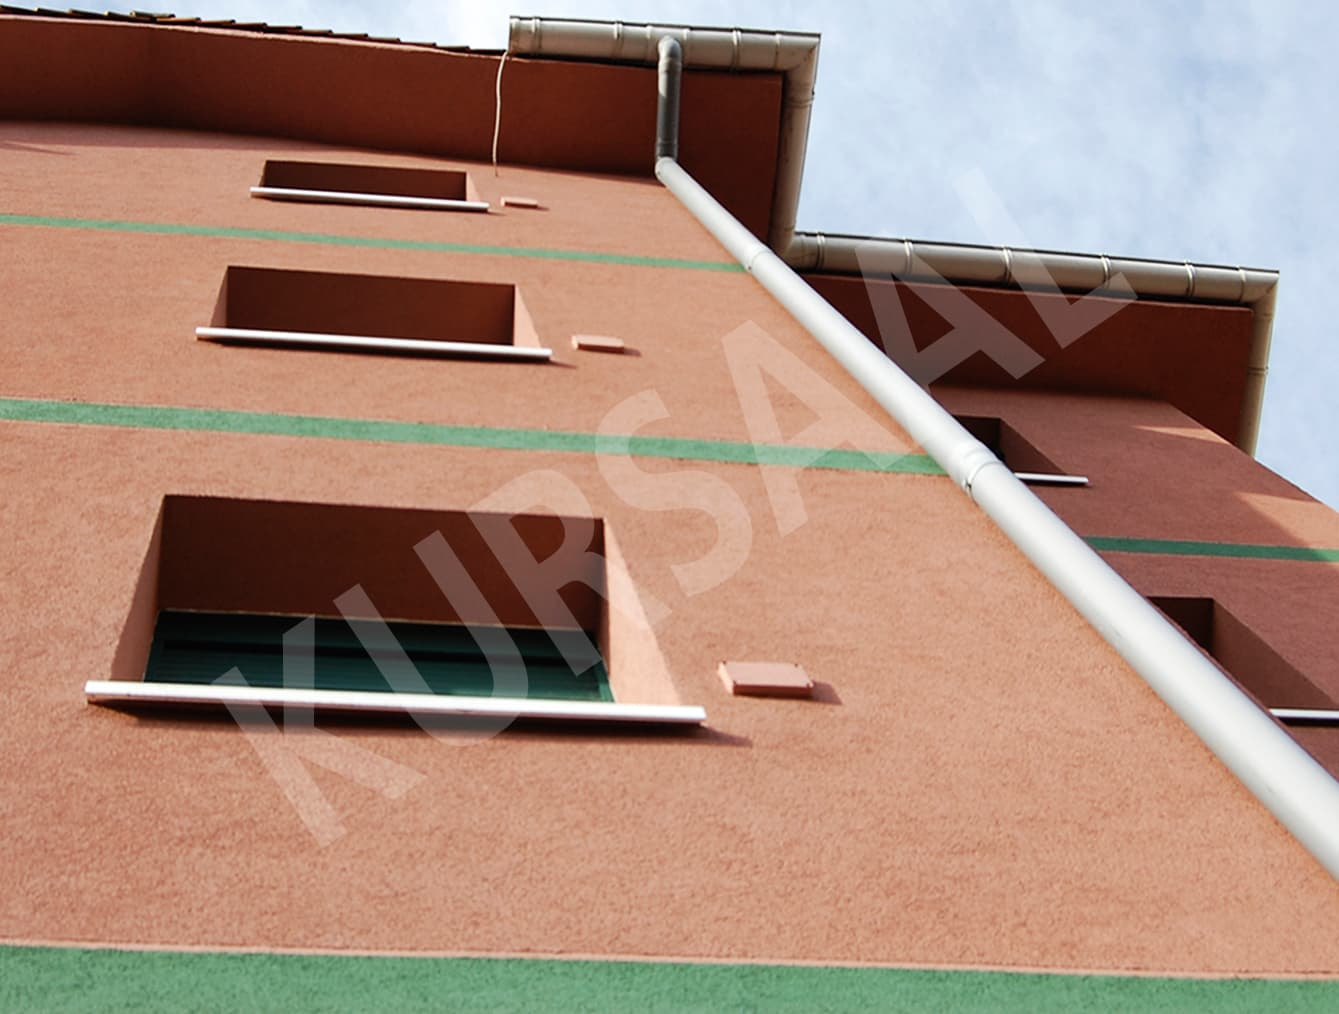 foto 4 - Aislamientos Térmicos y Eficiencia Energética-Prudencia Arbide 14-IRUN, GIPUZKOA